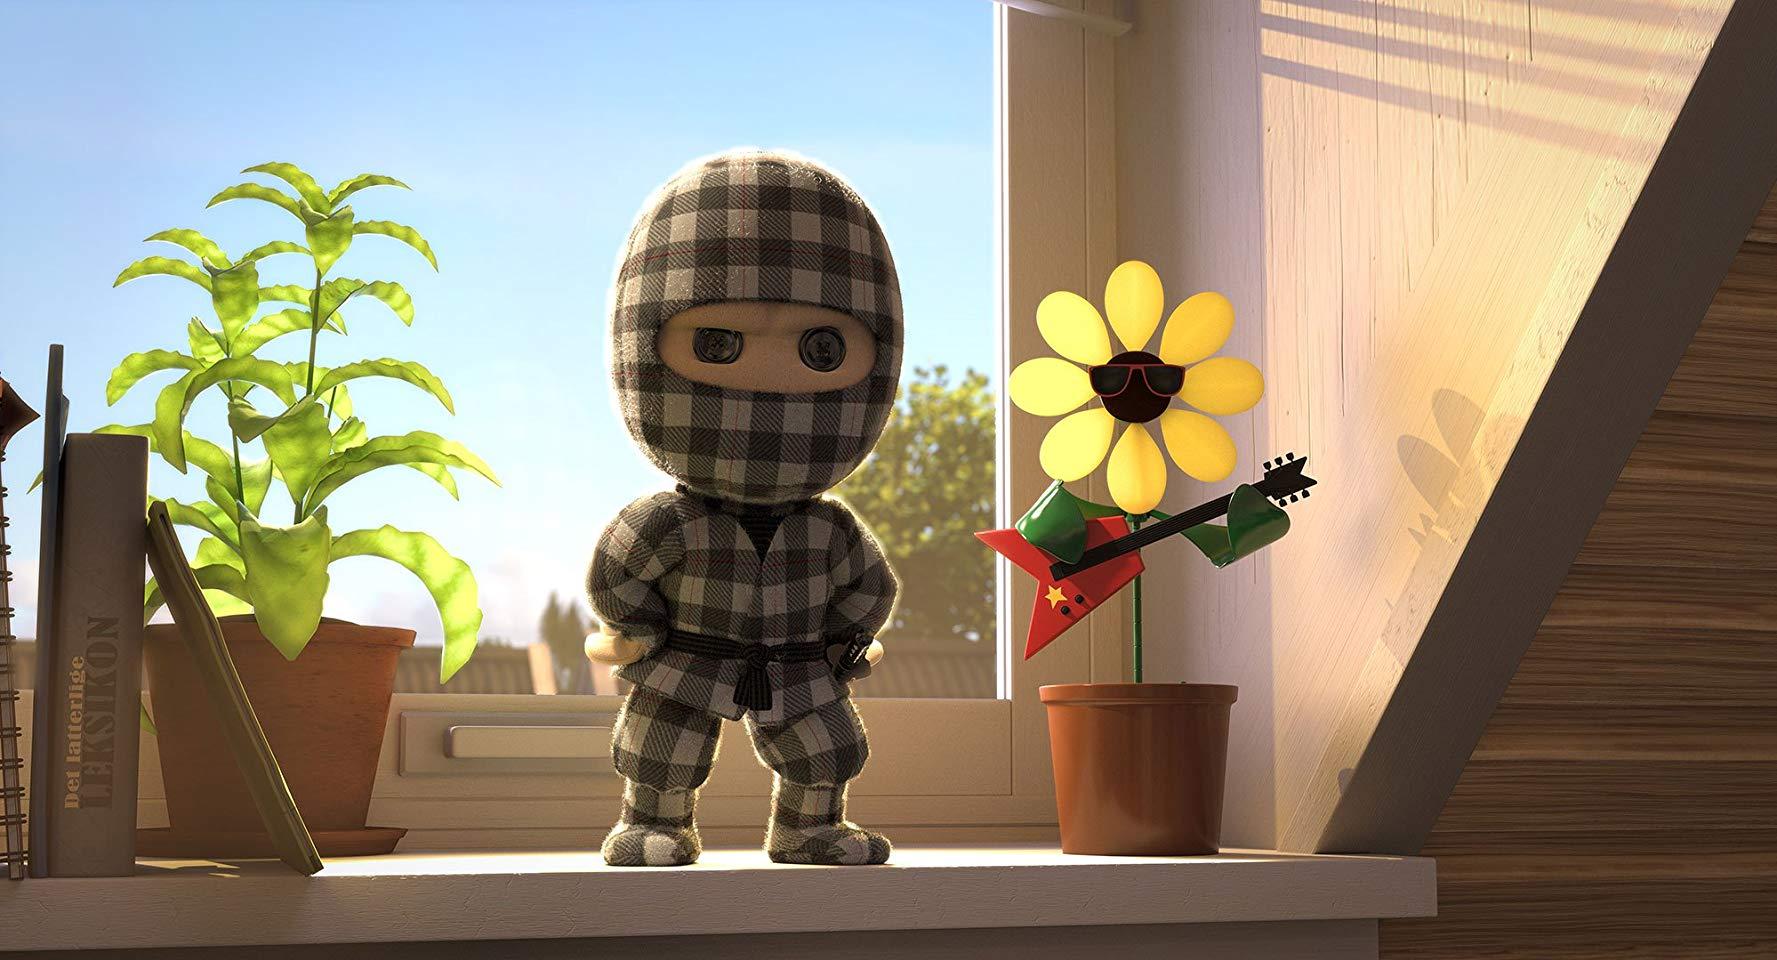 Checkered Ninja (Ternet ninja)